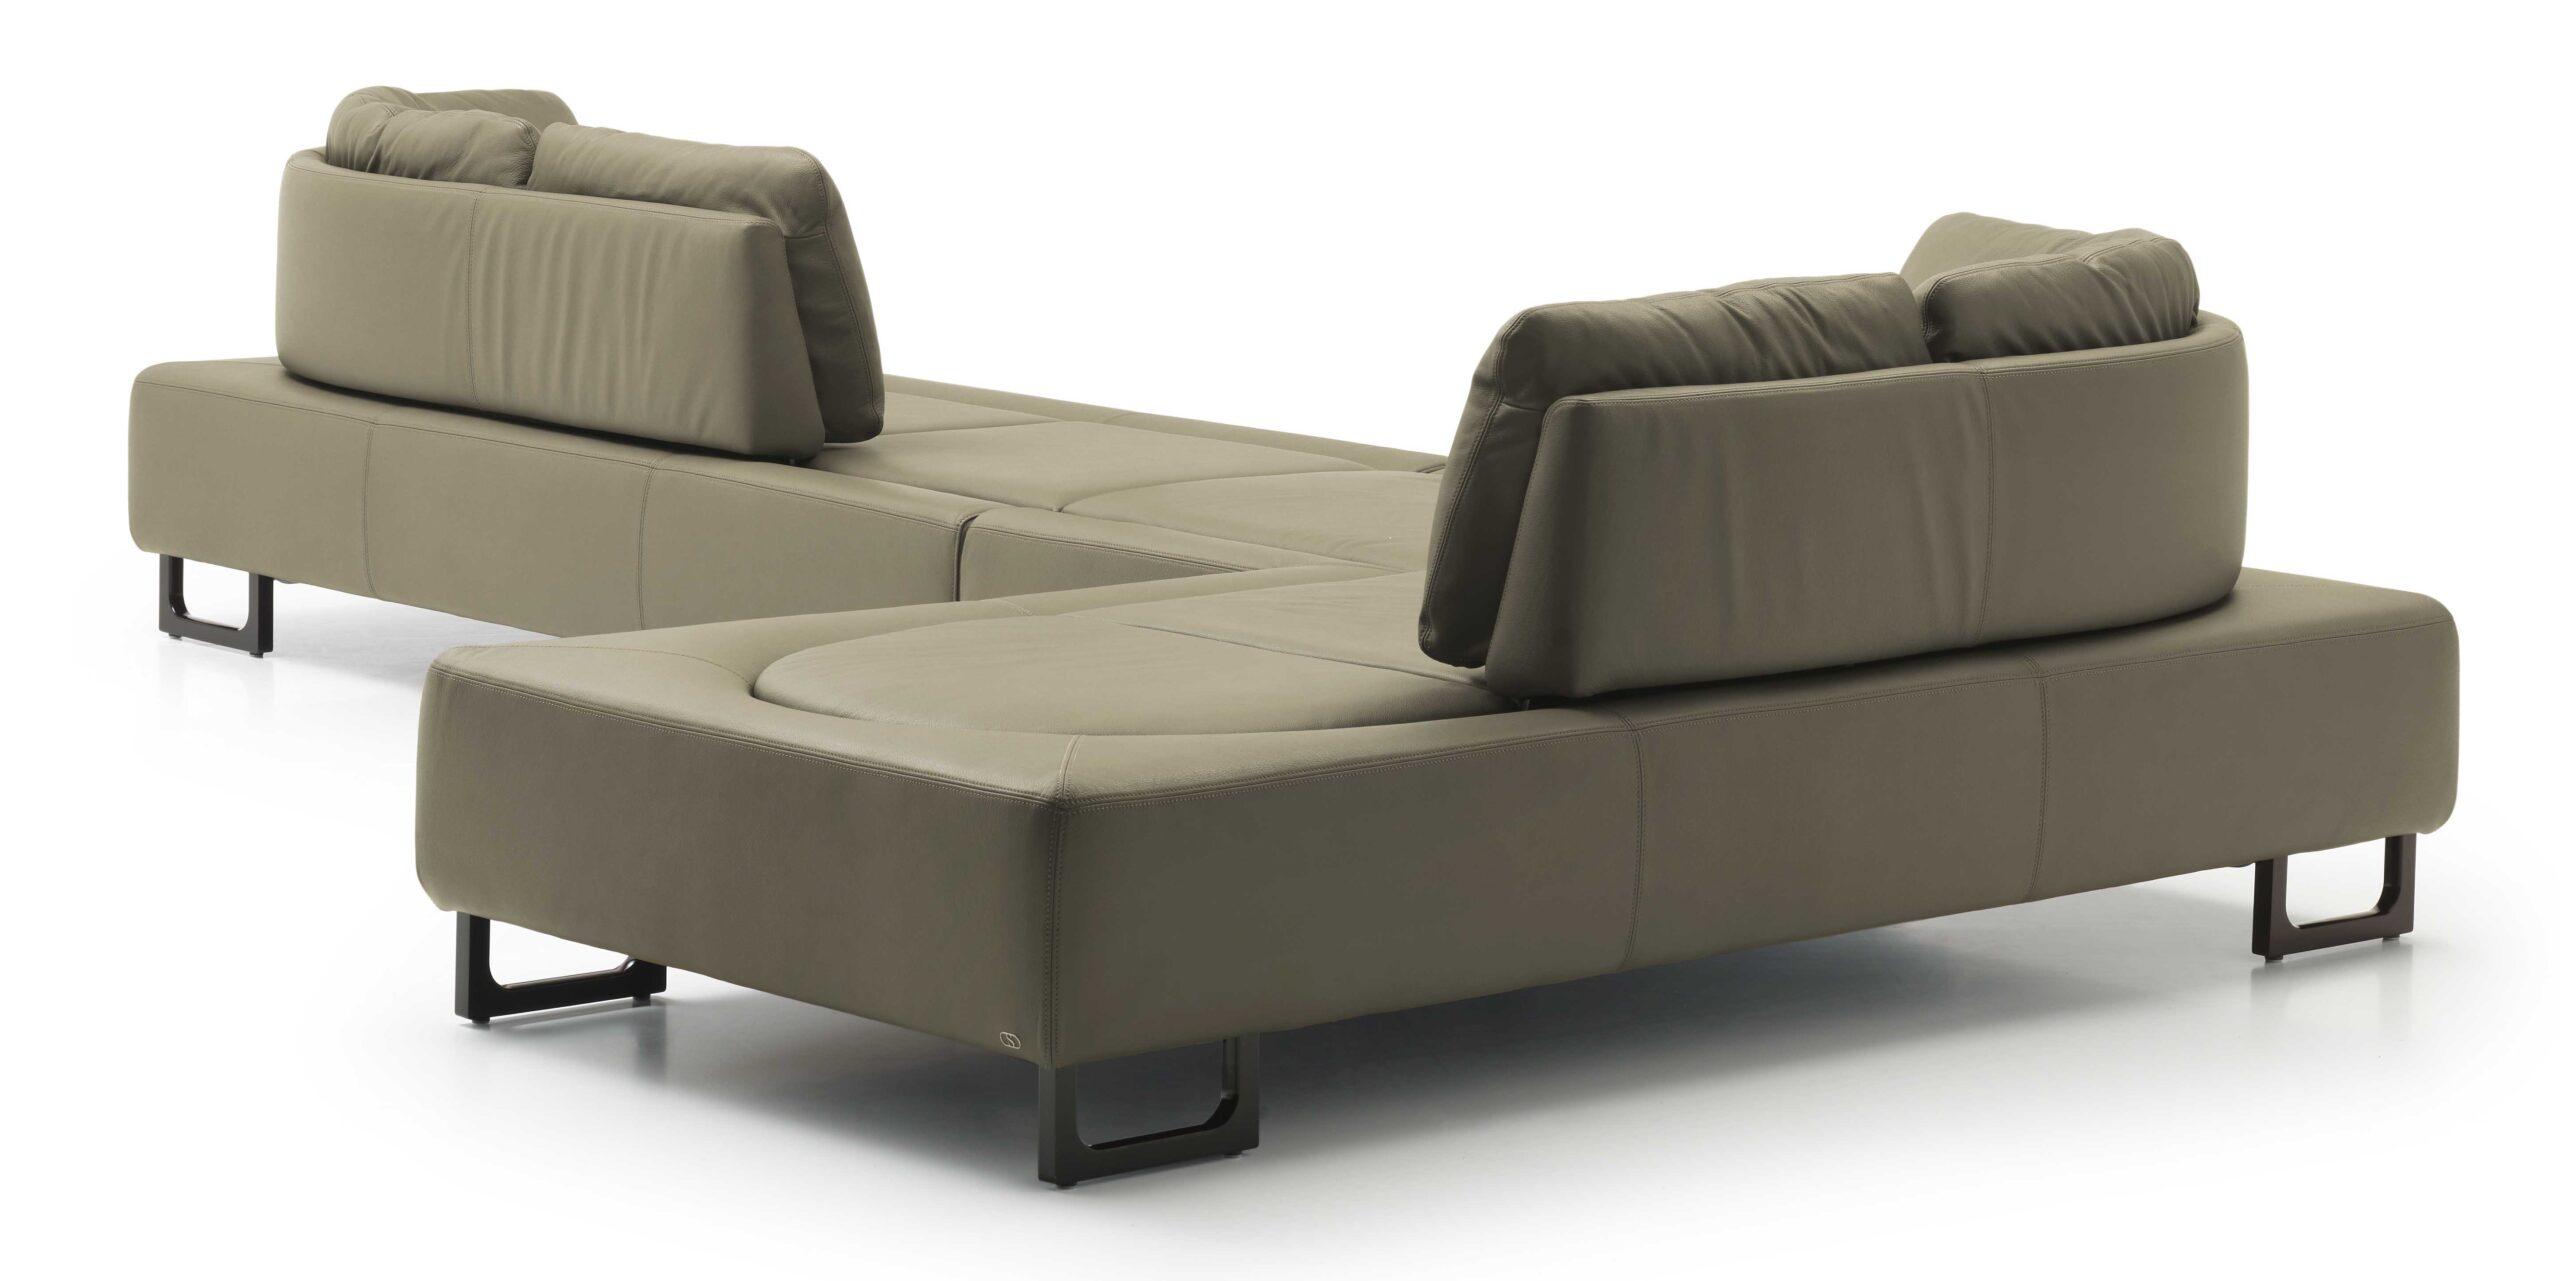 Full Size of De Sede Sofa Outlet Preis Sleeper For Sale Endless Ds 600 Bi Furniture Usa Uk Gebraucht Sessel Preise Bed Kaufen 47 Schweiz Used Beziehen Comfortmaster Sofa De Sede Sofa